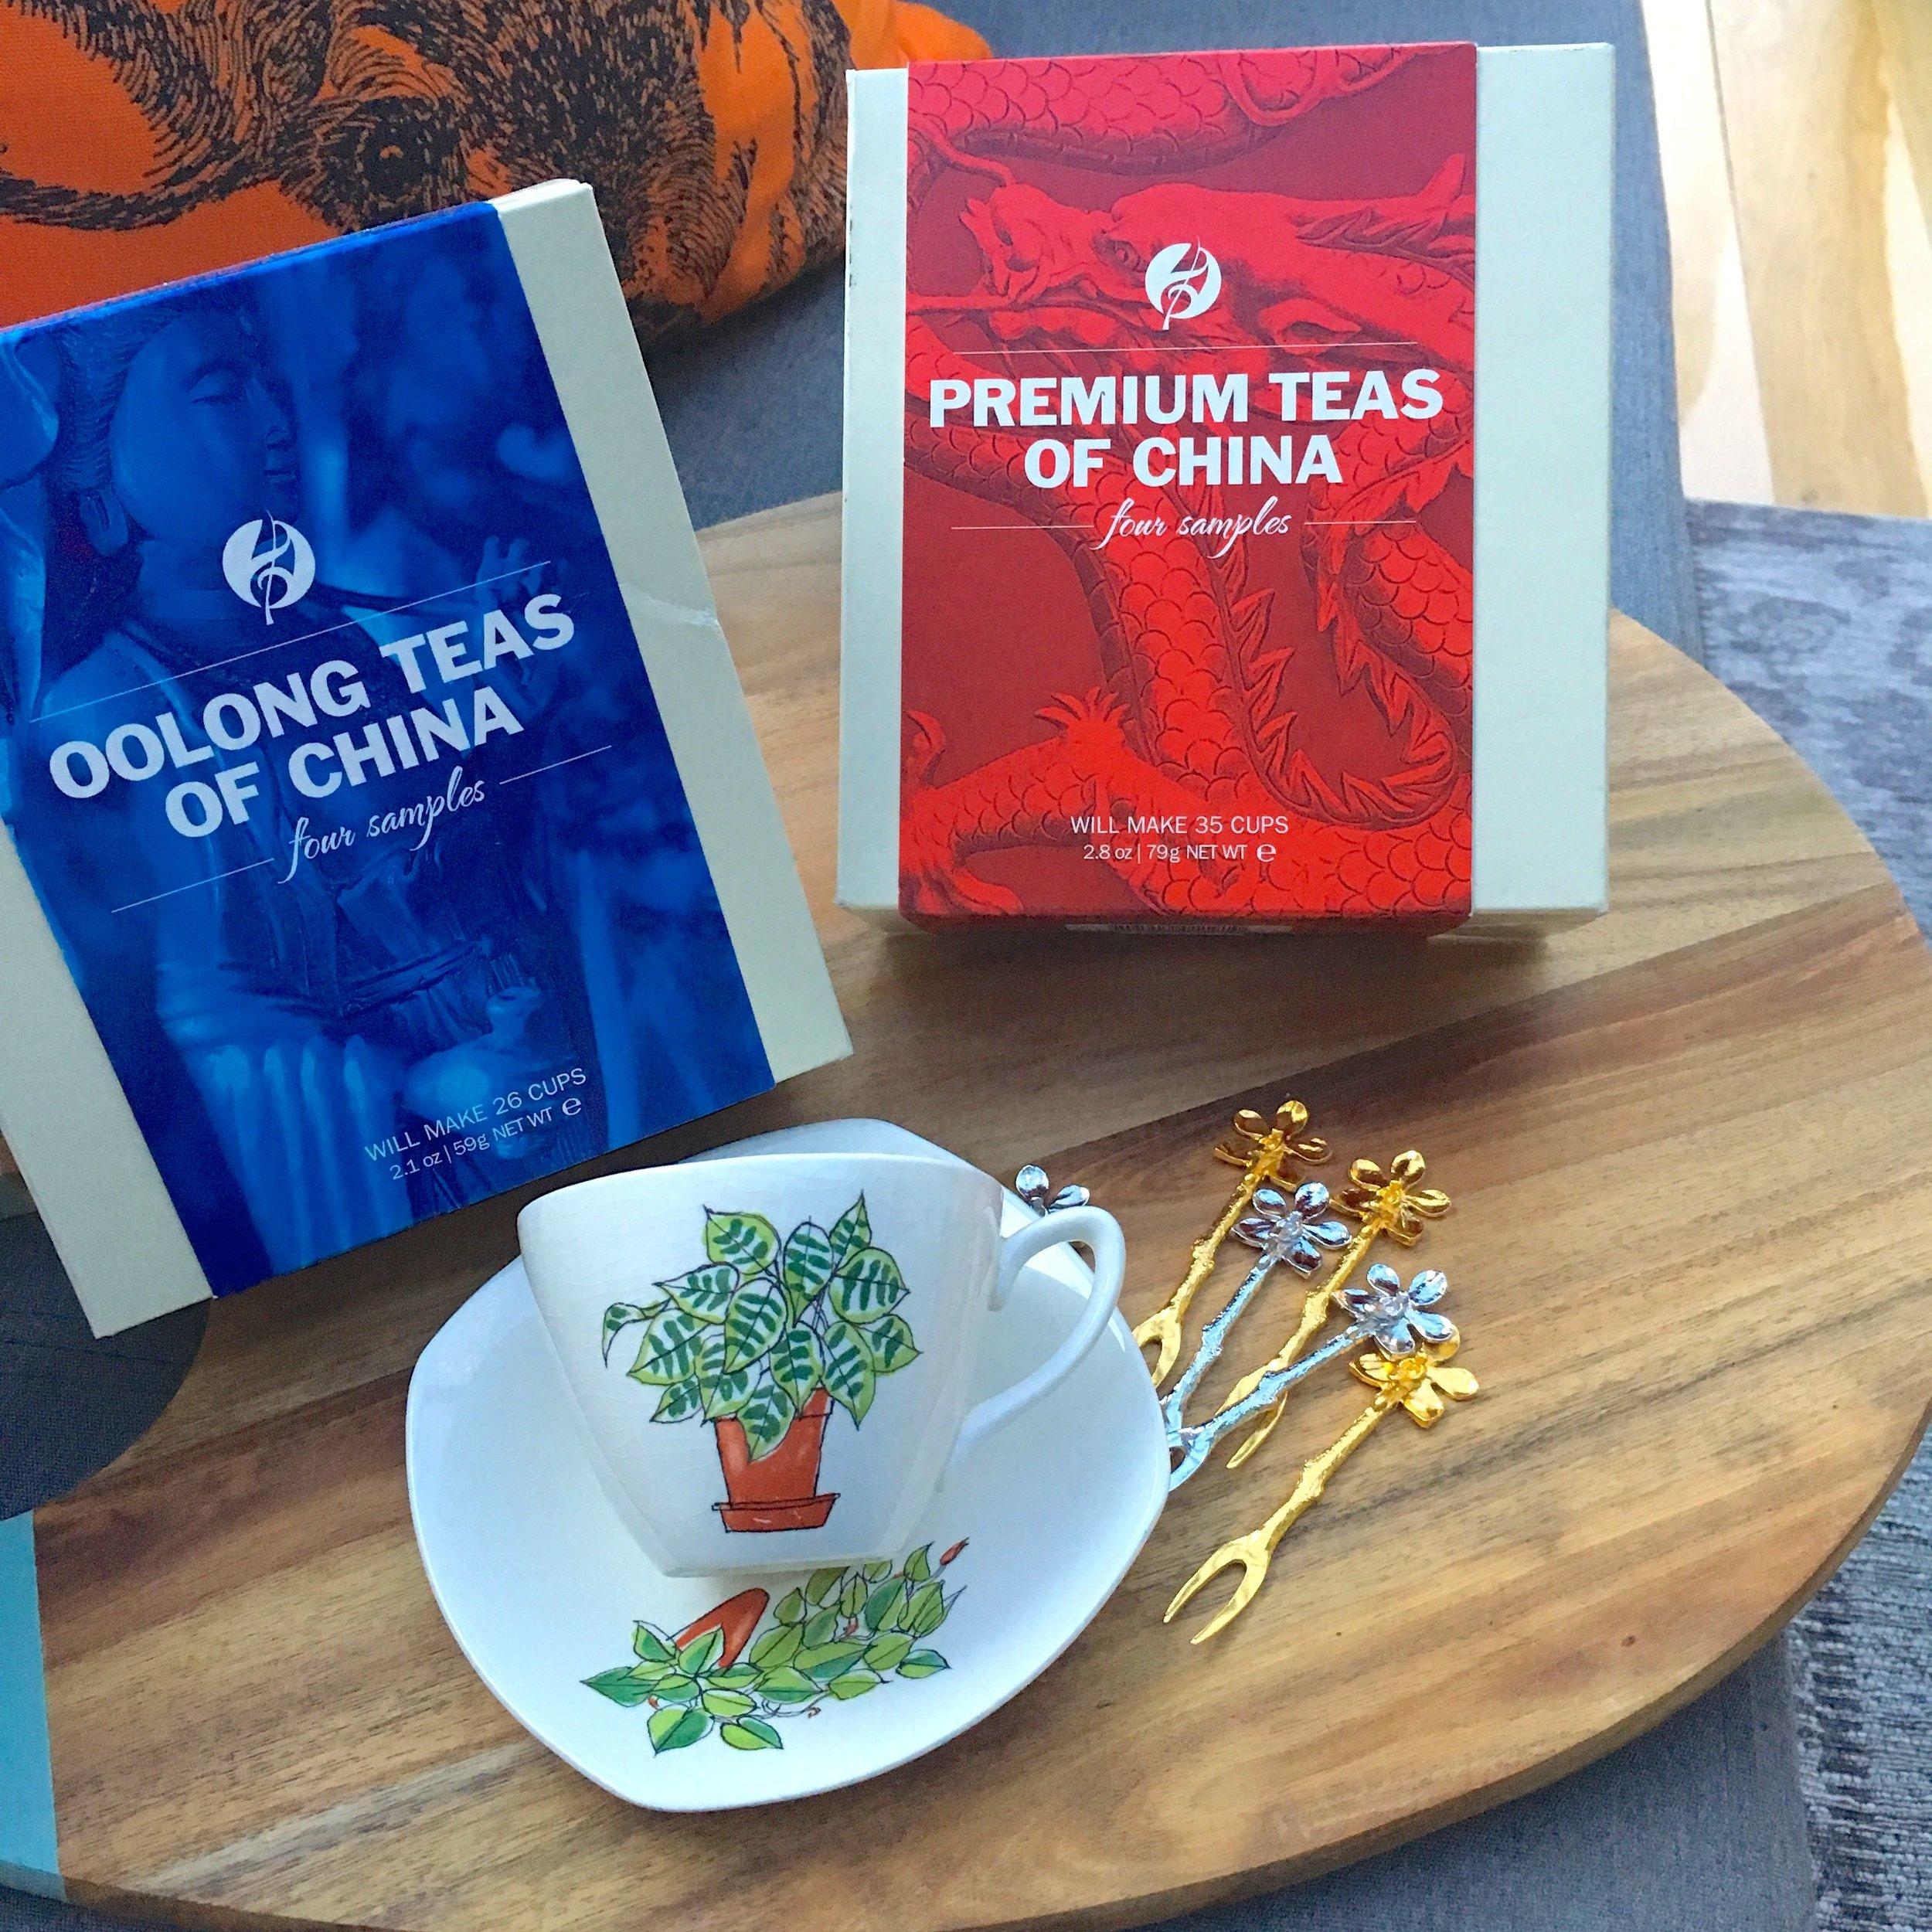 OOLONG TEAS OF CHINA INCLUDES: TI KUAN YIN, WUYI ENSEMBLE, FORMOSA BAI HAO AND DANCONG ARIA TEAS  PREMIUM TEAS OF CHINA INCLUDES: YUNNAN GOLD, GOLDEN SPRING, KEEMUN RHAPSODY AND PU ERH POE TEAS